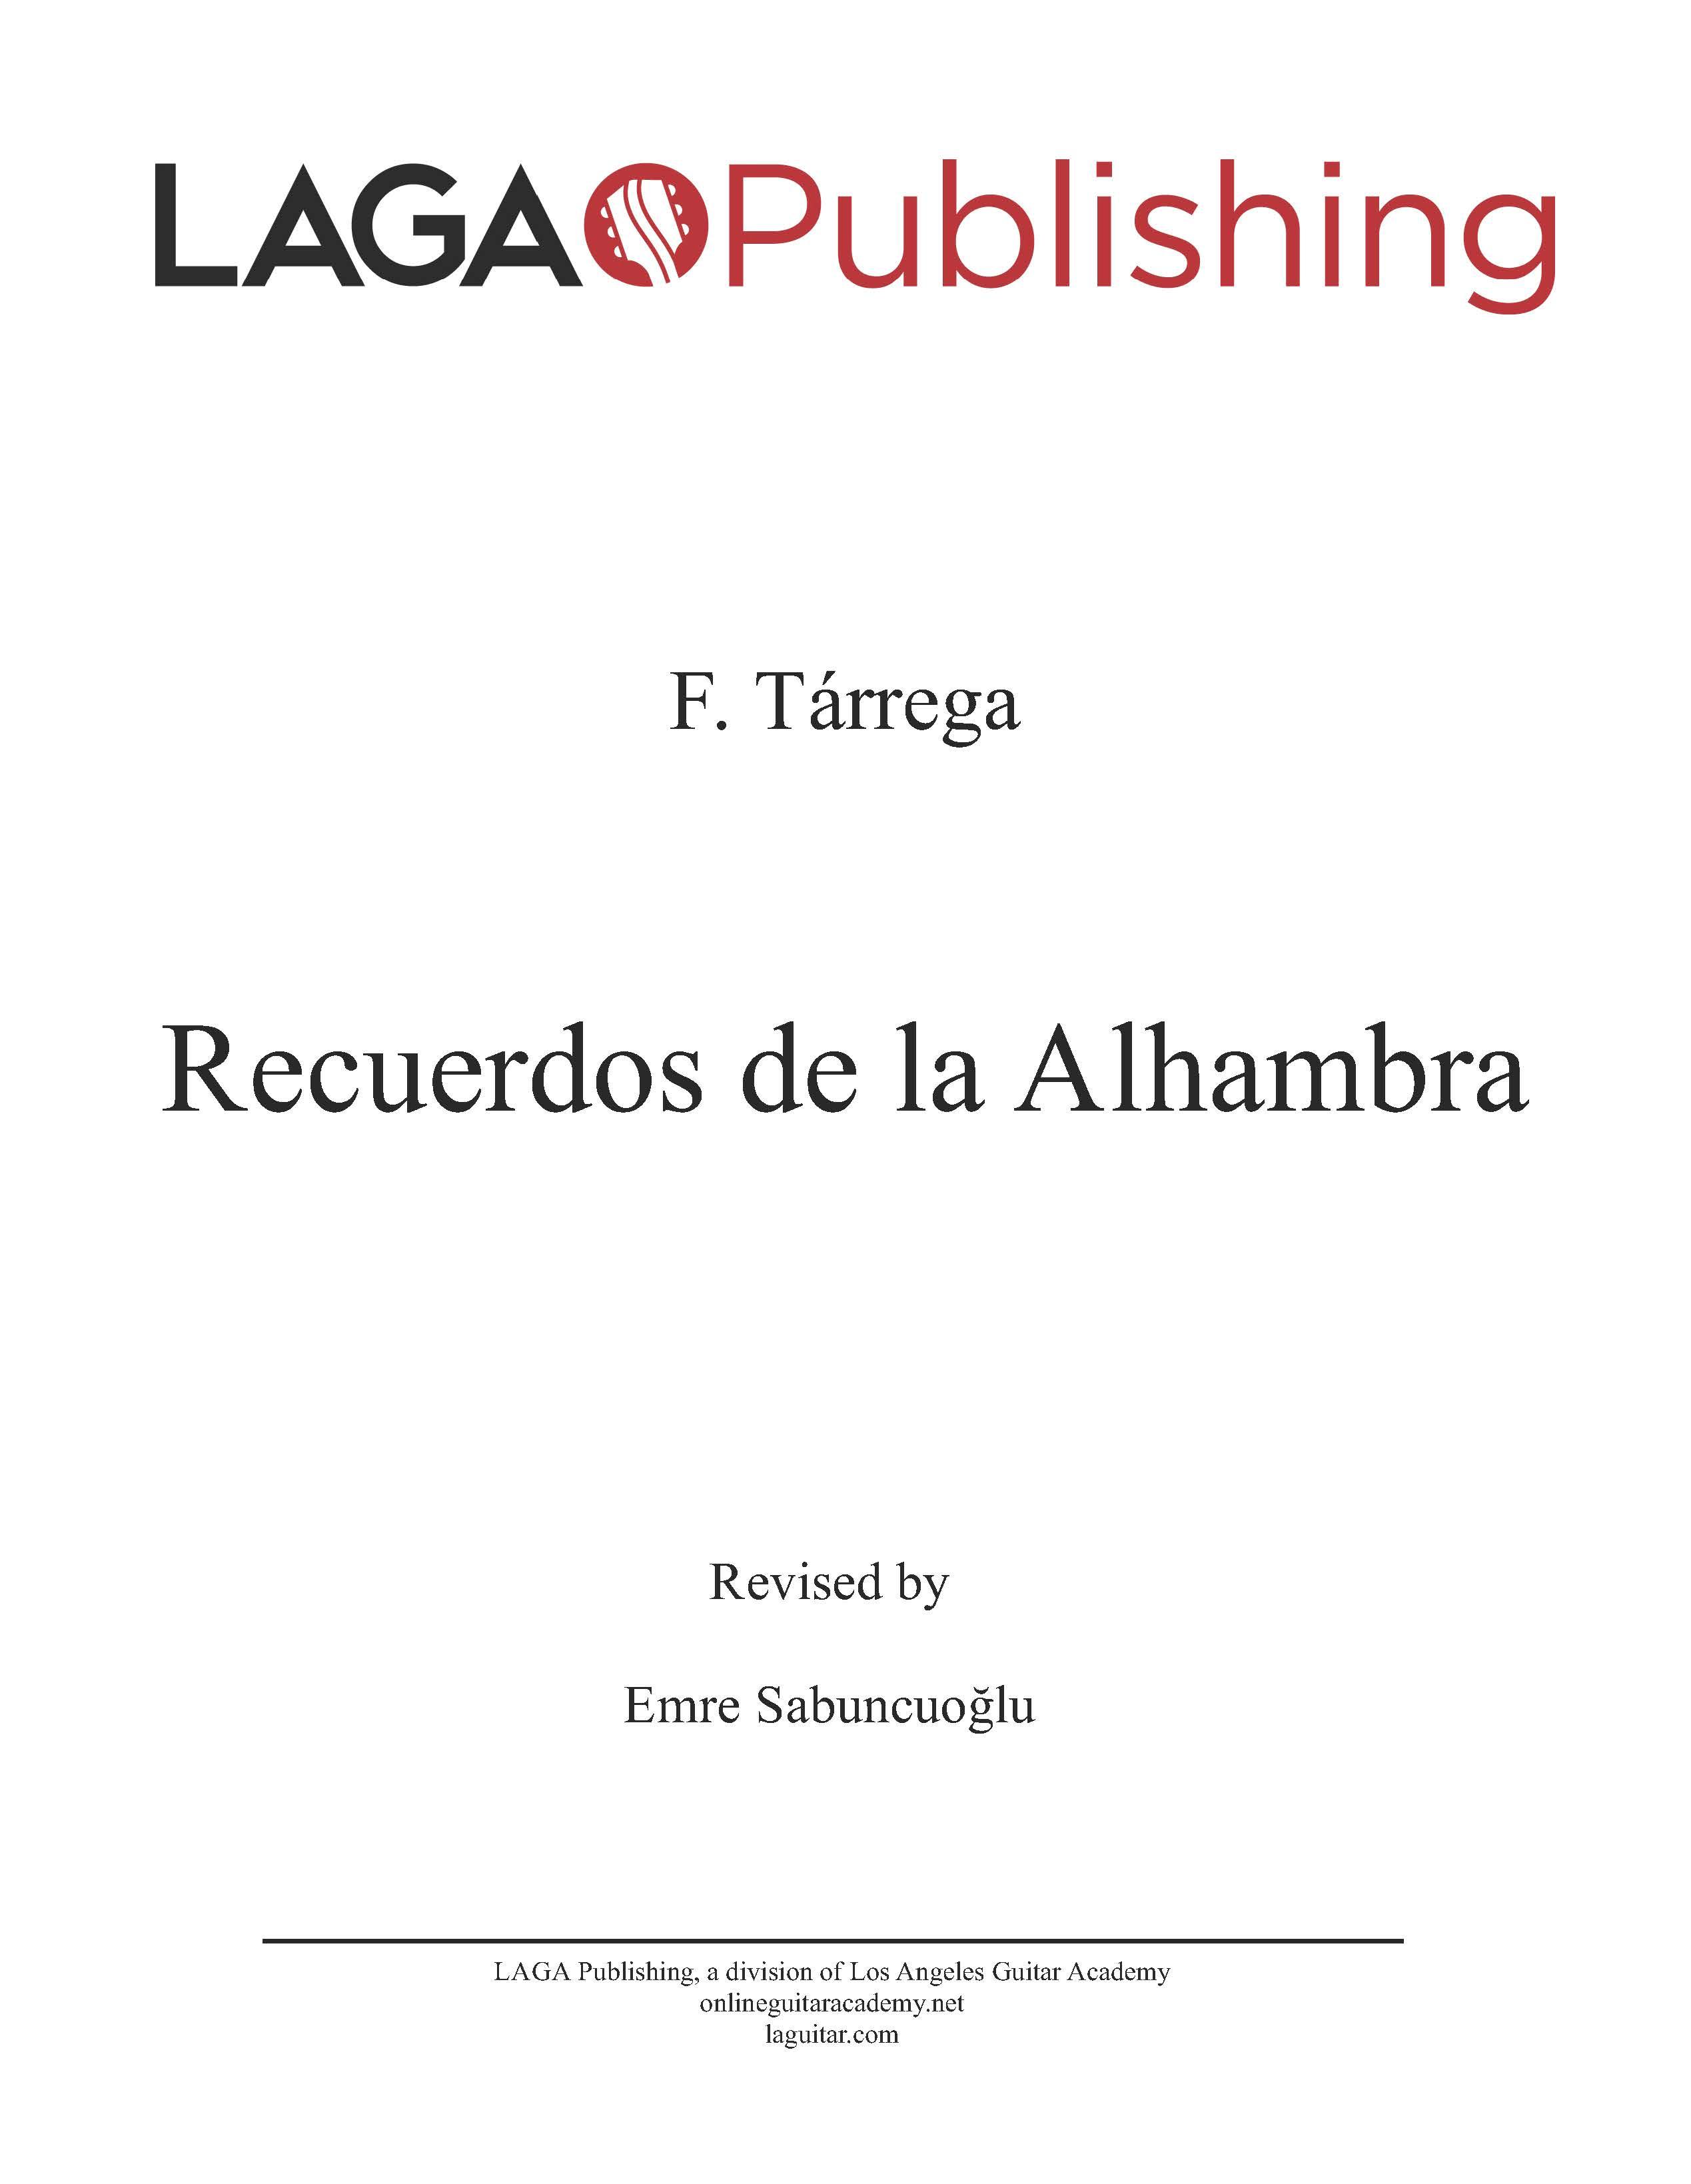 LAGA-Publishing-Tarrega-Recuerdos-Score-and-Tab